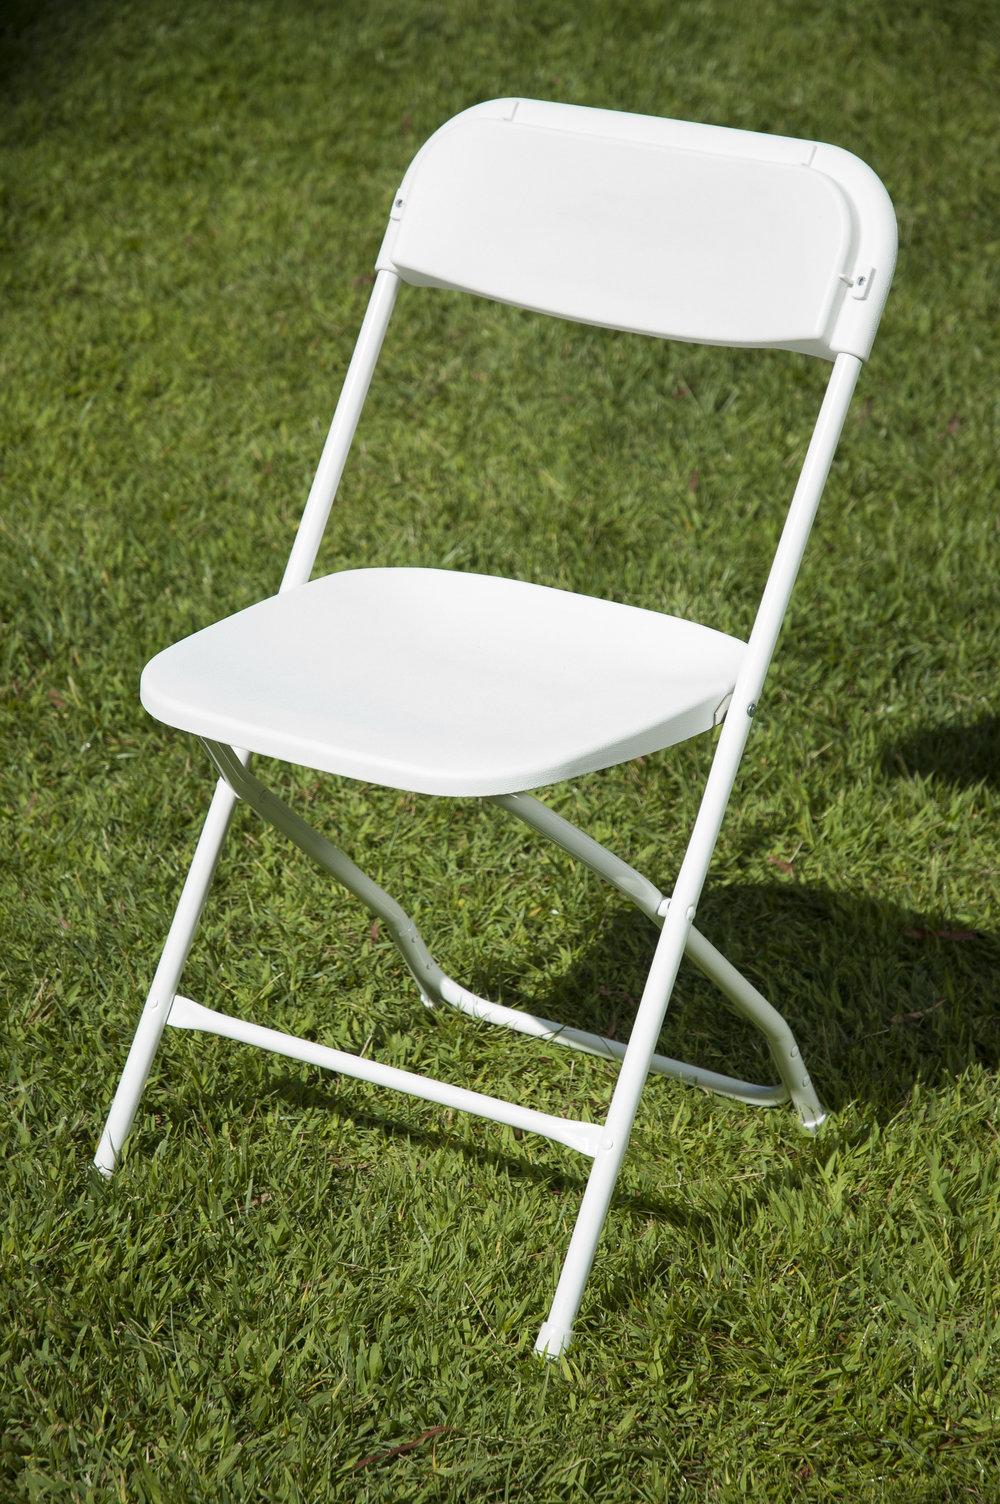 White-Samsonite-Chairs-Garden.jpg